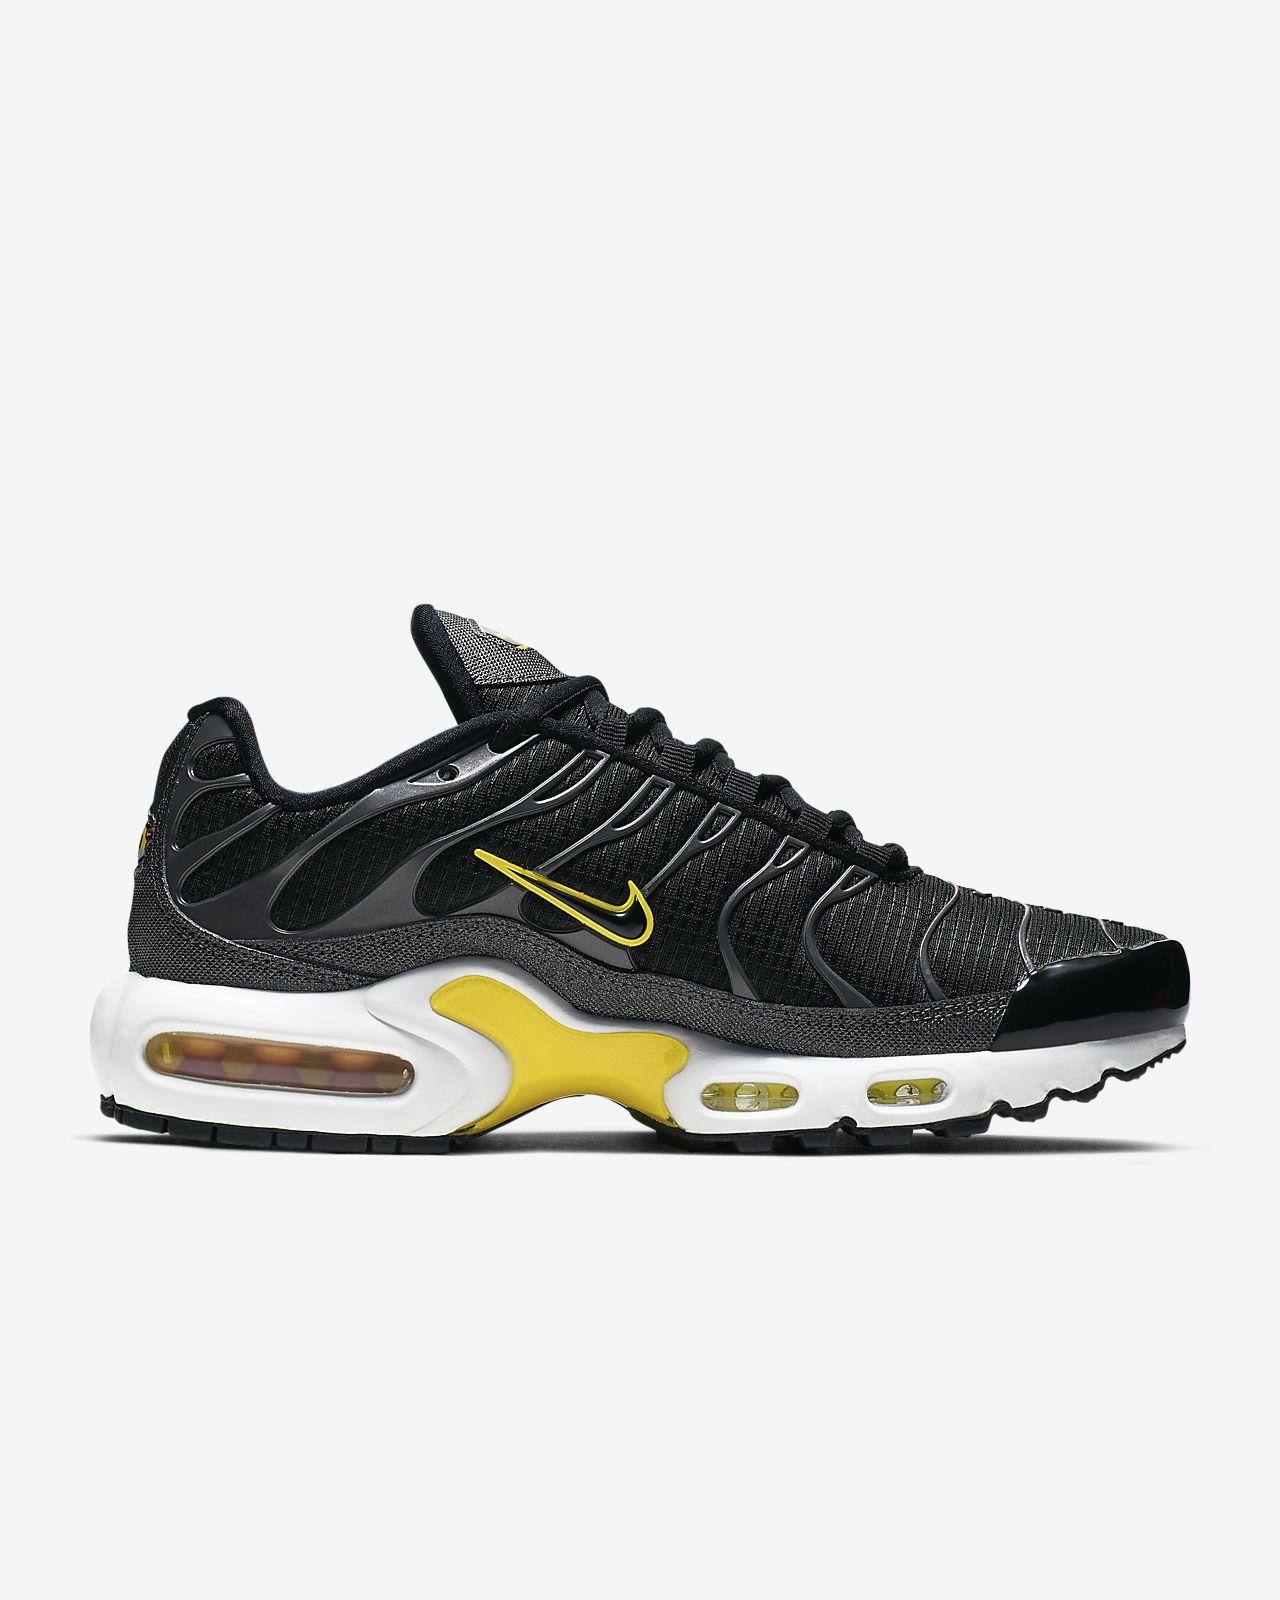 Nike Air Max 95 Femme Chaussures Toute Gris Foncé